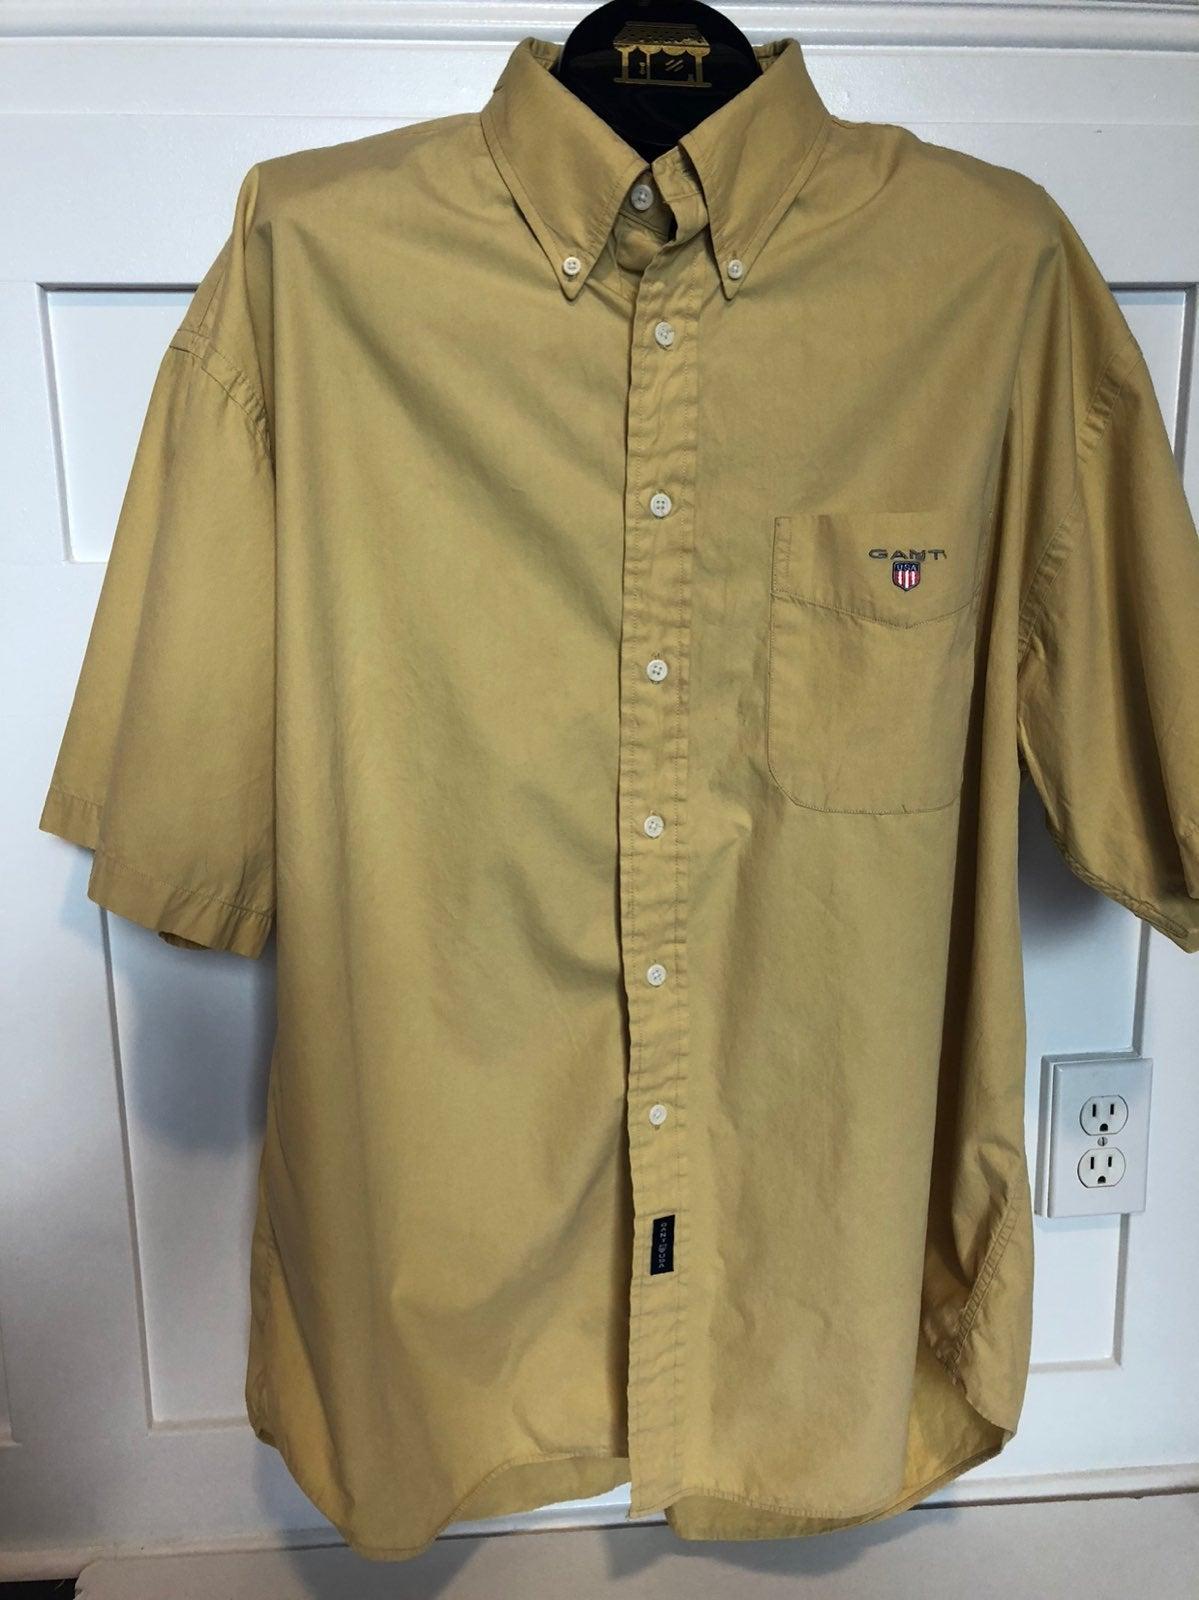 Vintage Gant short sleeve button shirt 2